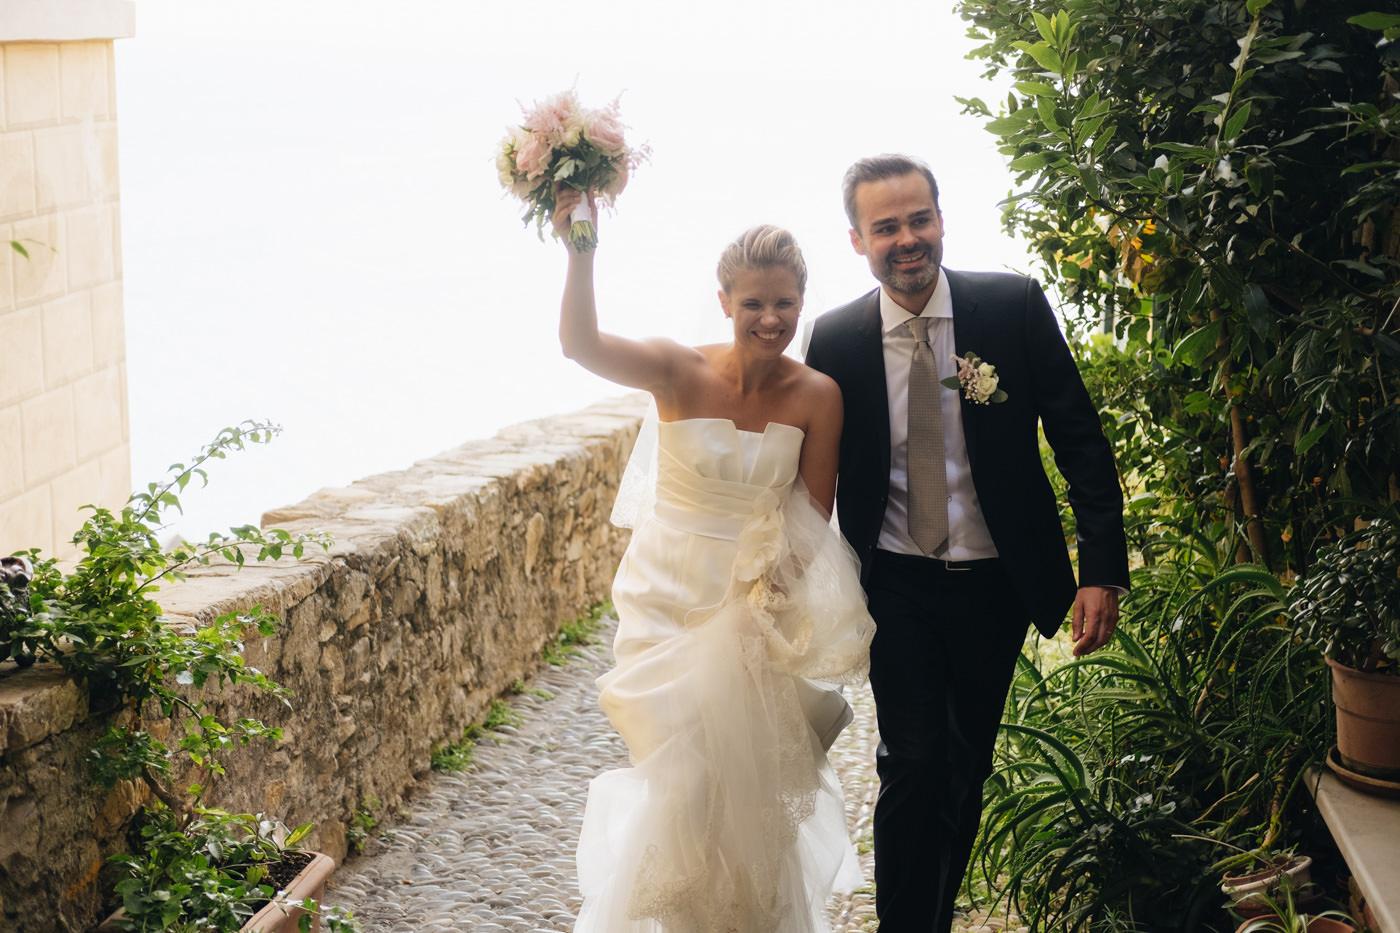 matrimoni_all_italiana_fotografo_matrimonio_cinque_terre-42.jpg